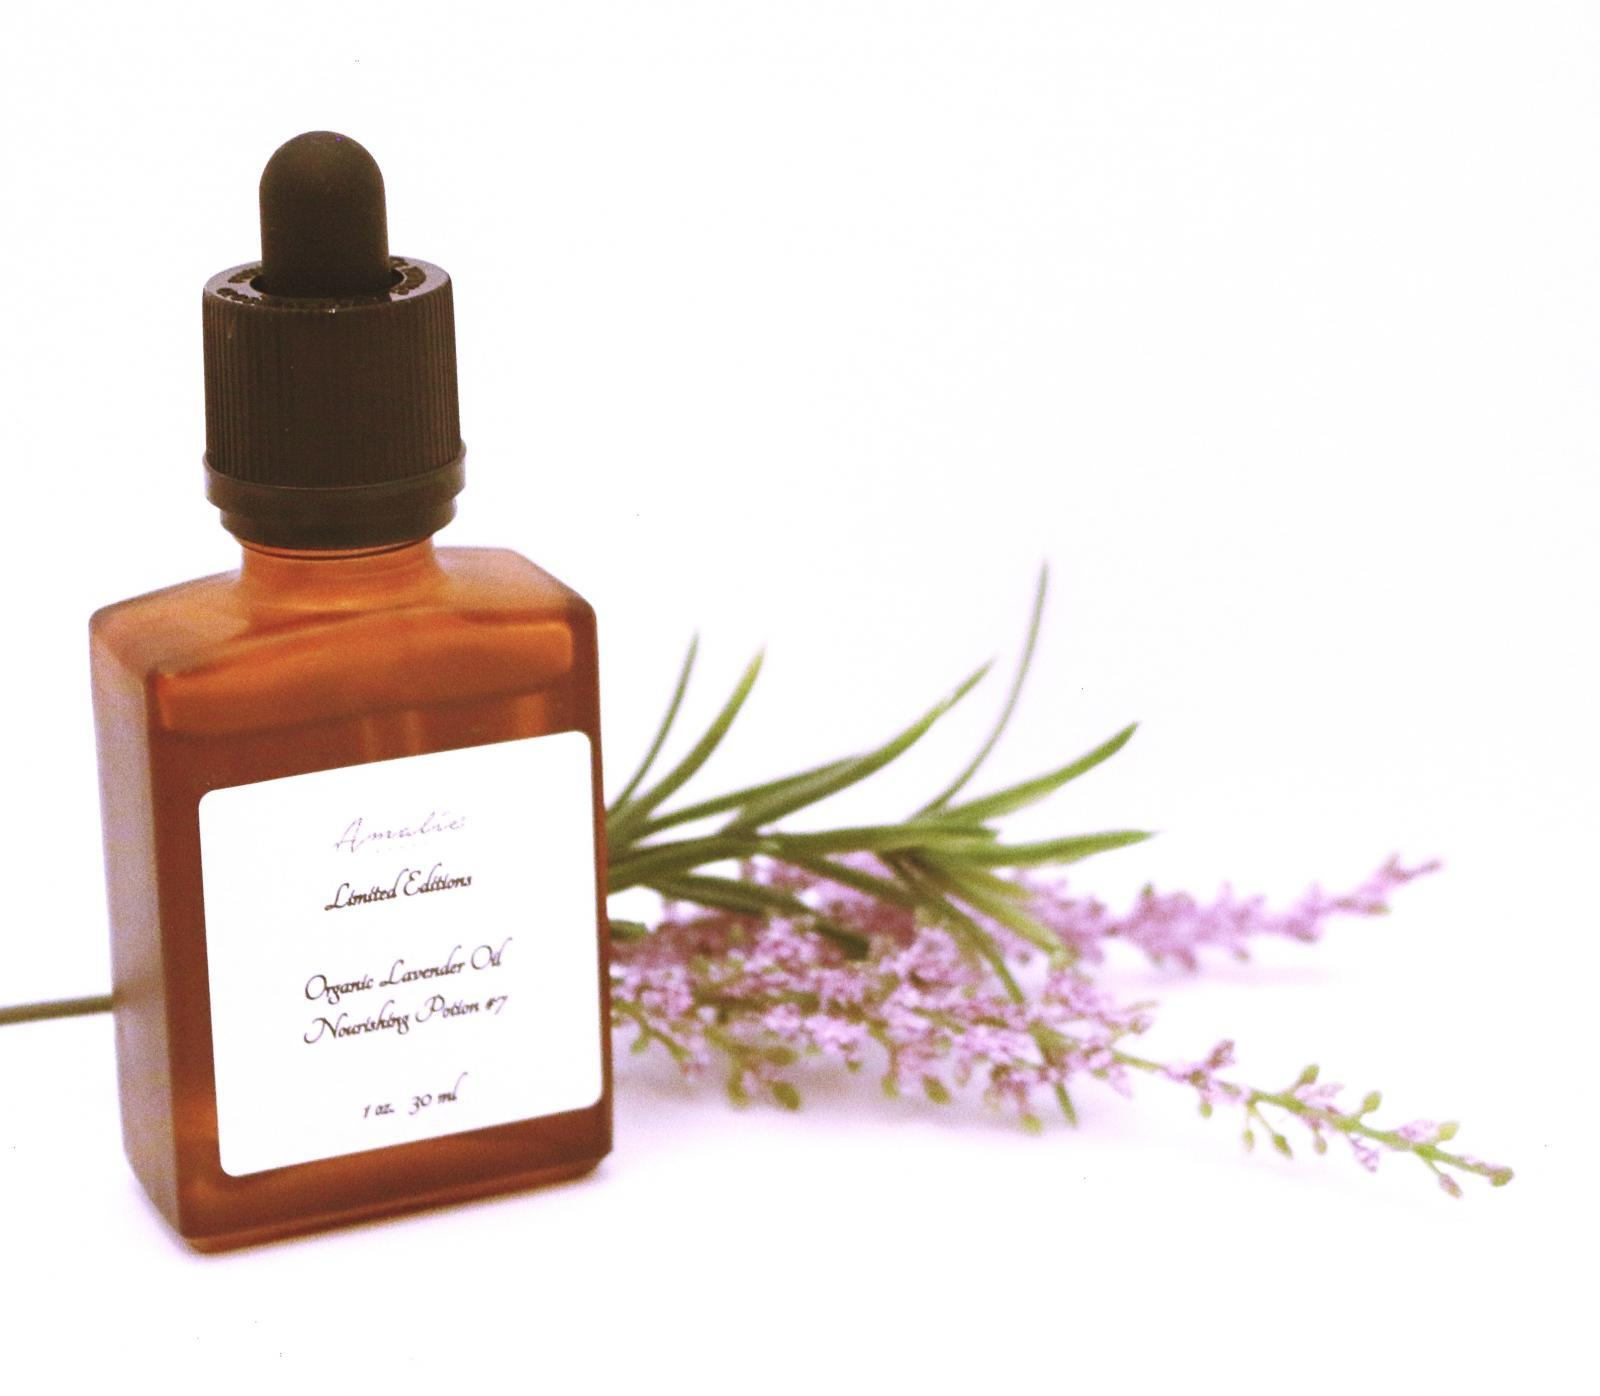 Limited Edition - Organic Lavender Nourishing Potion #7